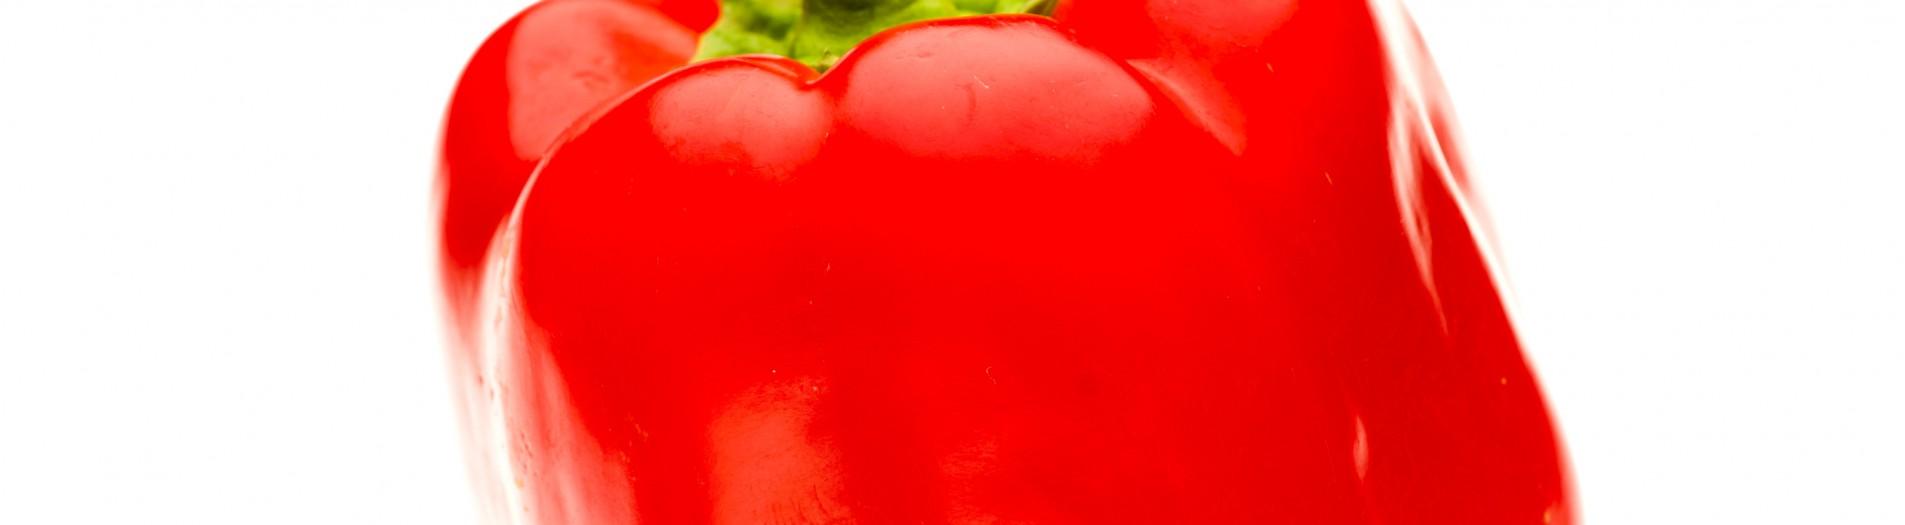 High-Key Veggies and Fruit